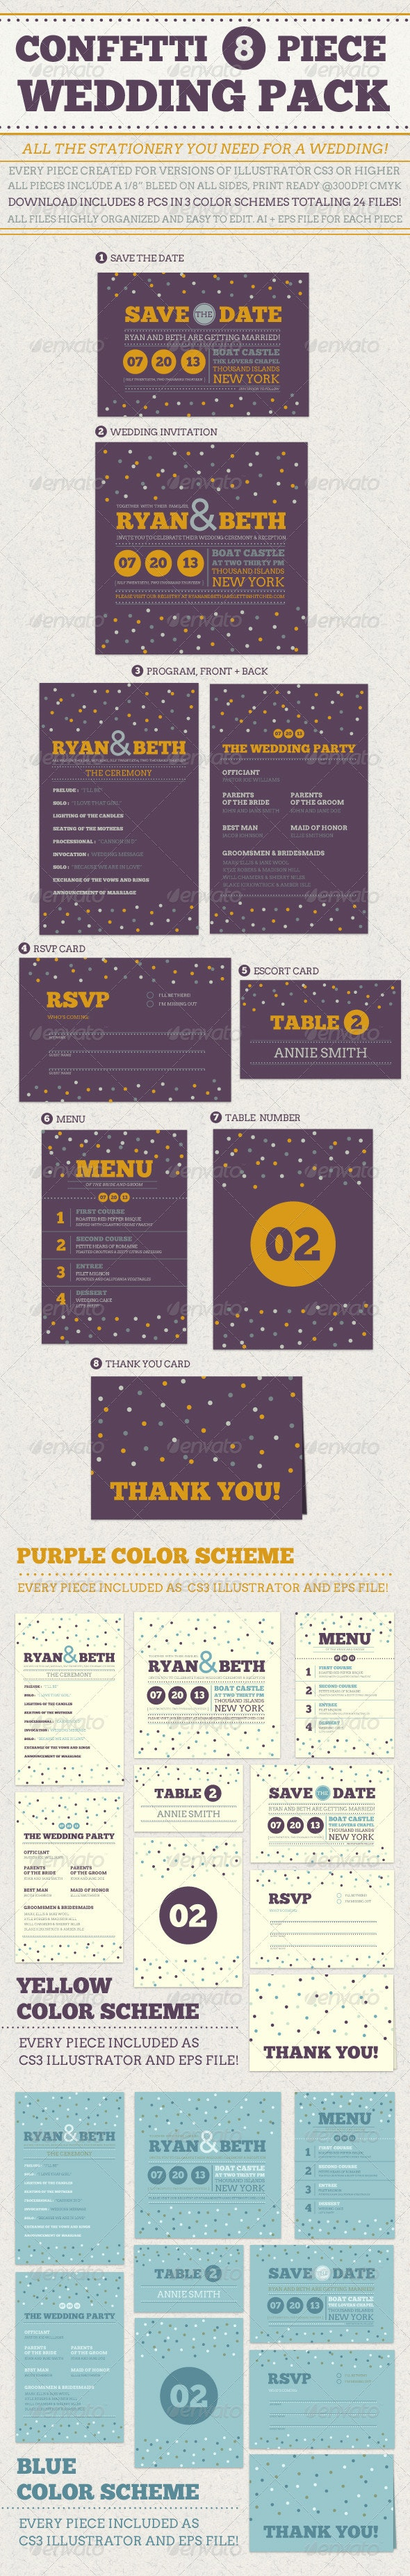 Confetti Wedding Pack - Weddings Cards & Invites